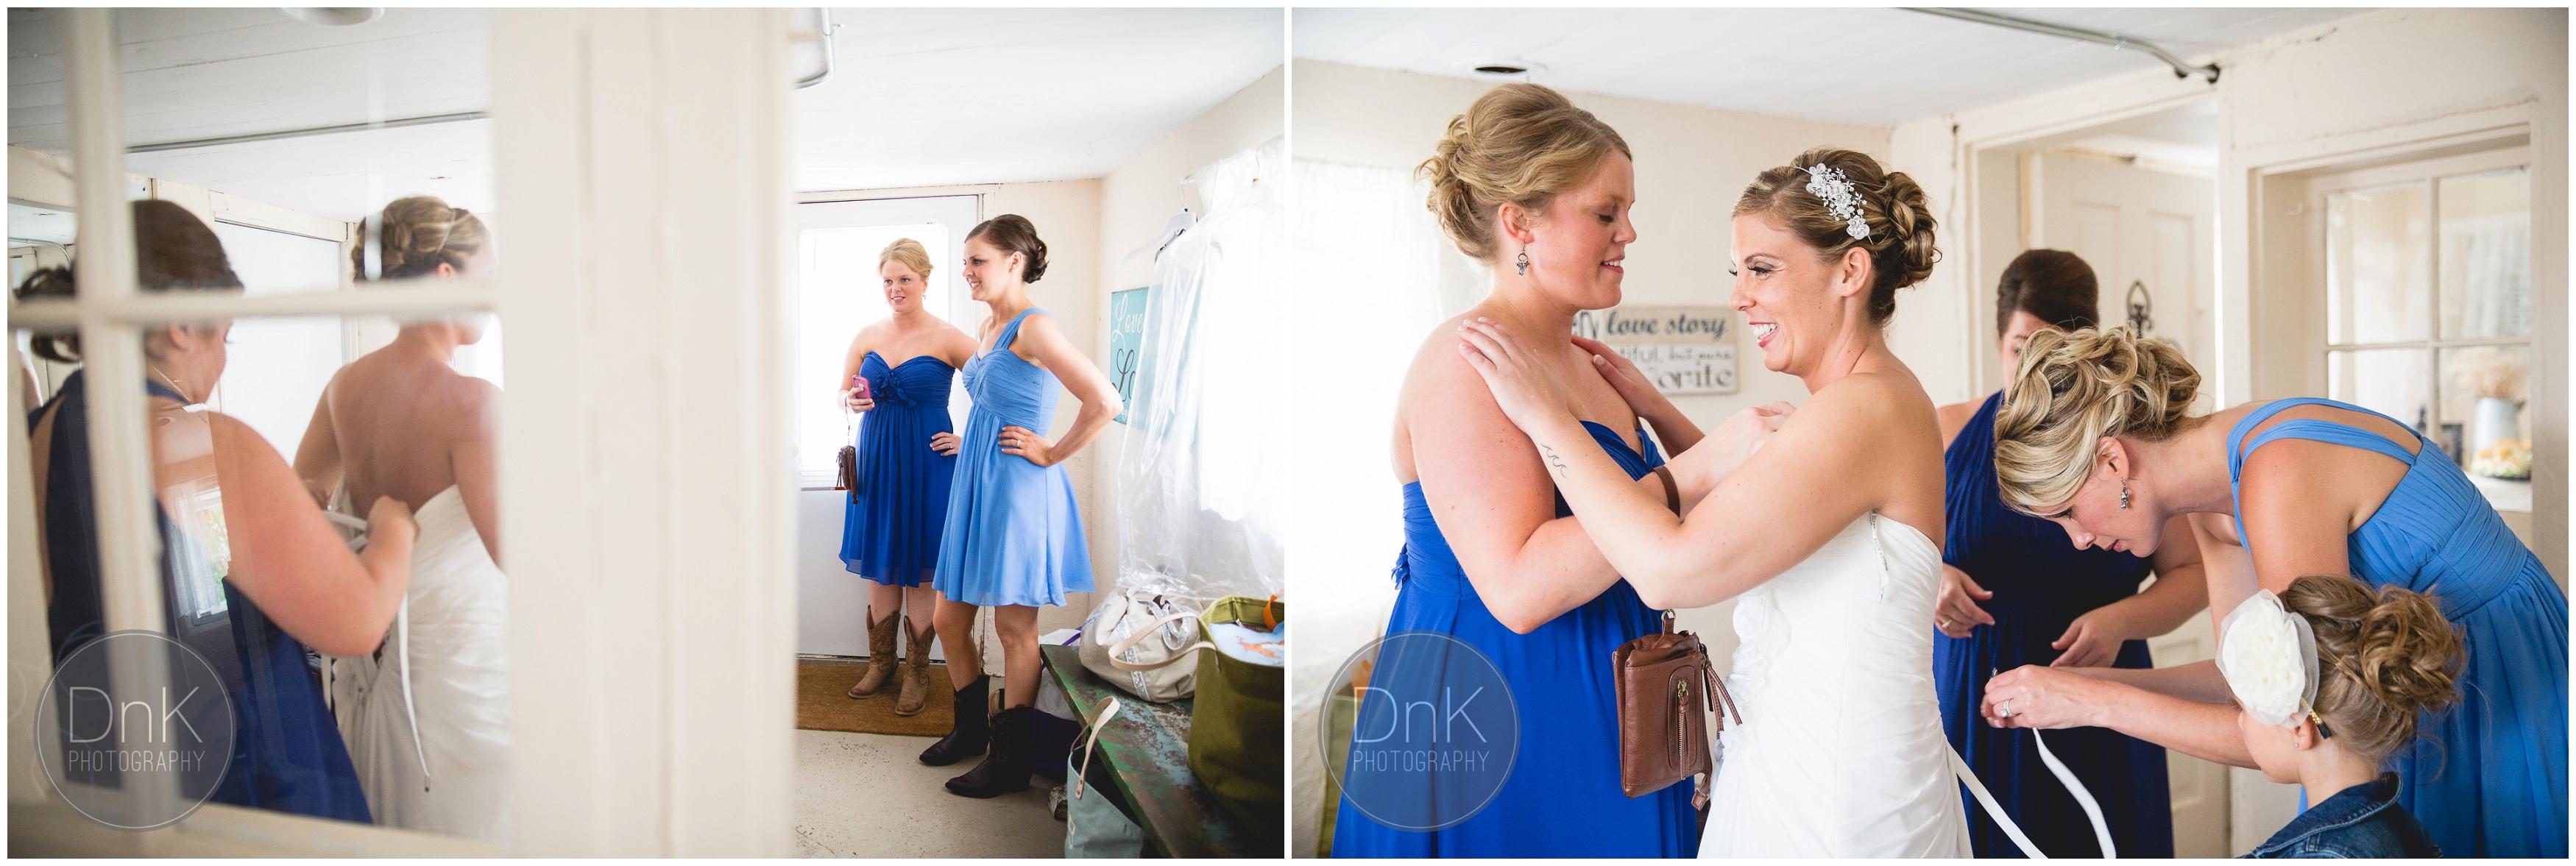 02- Dellwood Barn Wedding Photographer